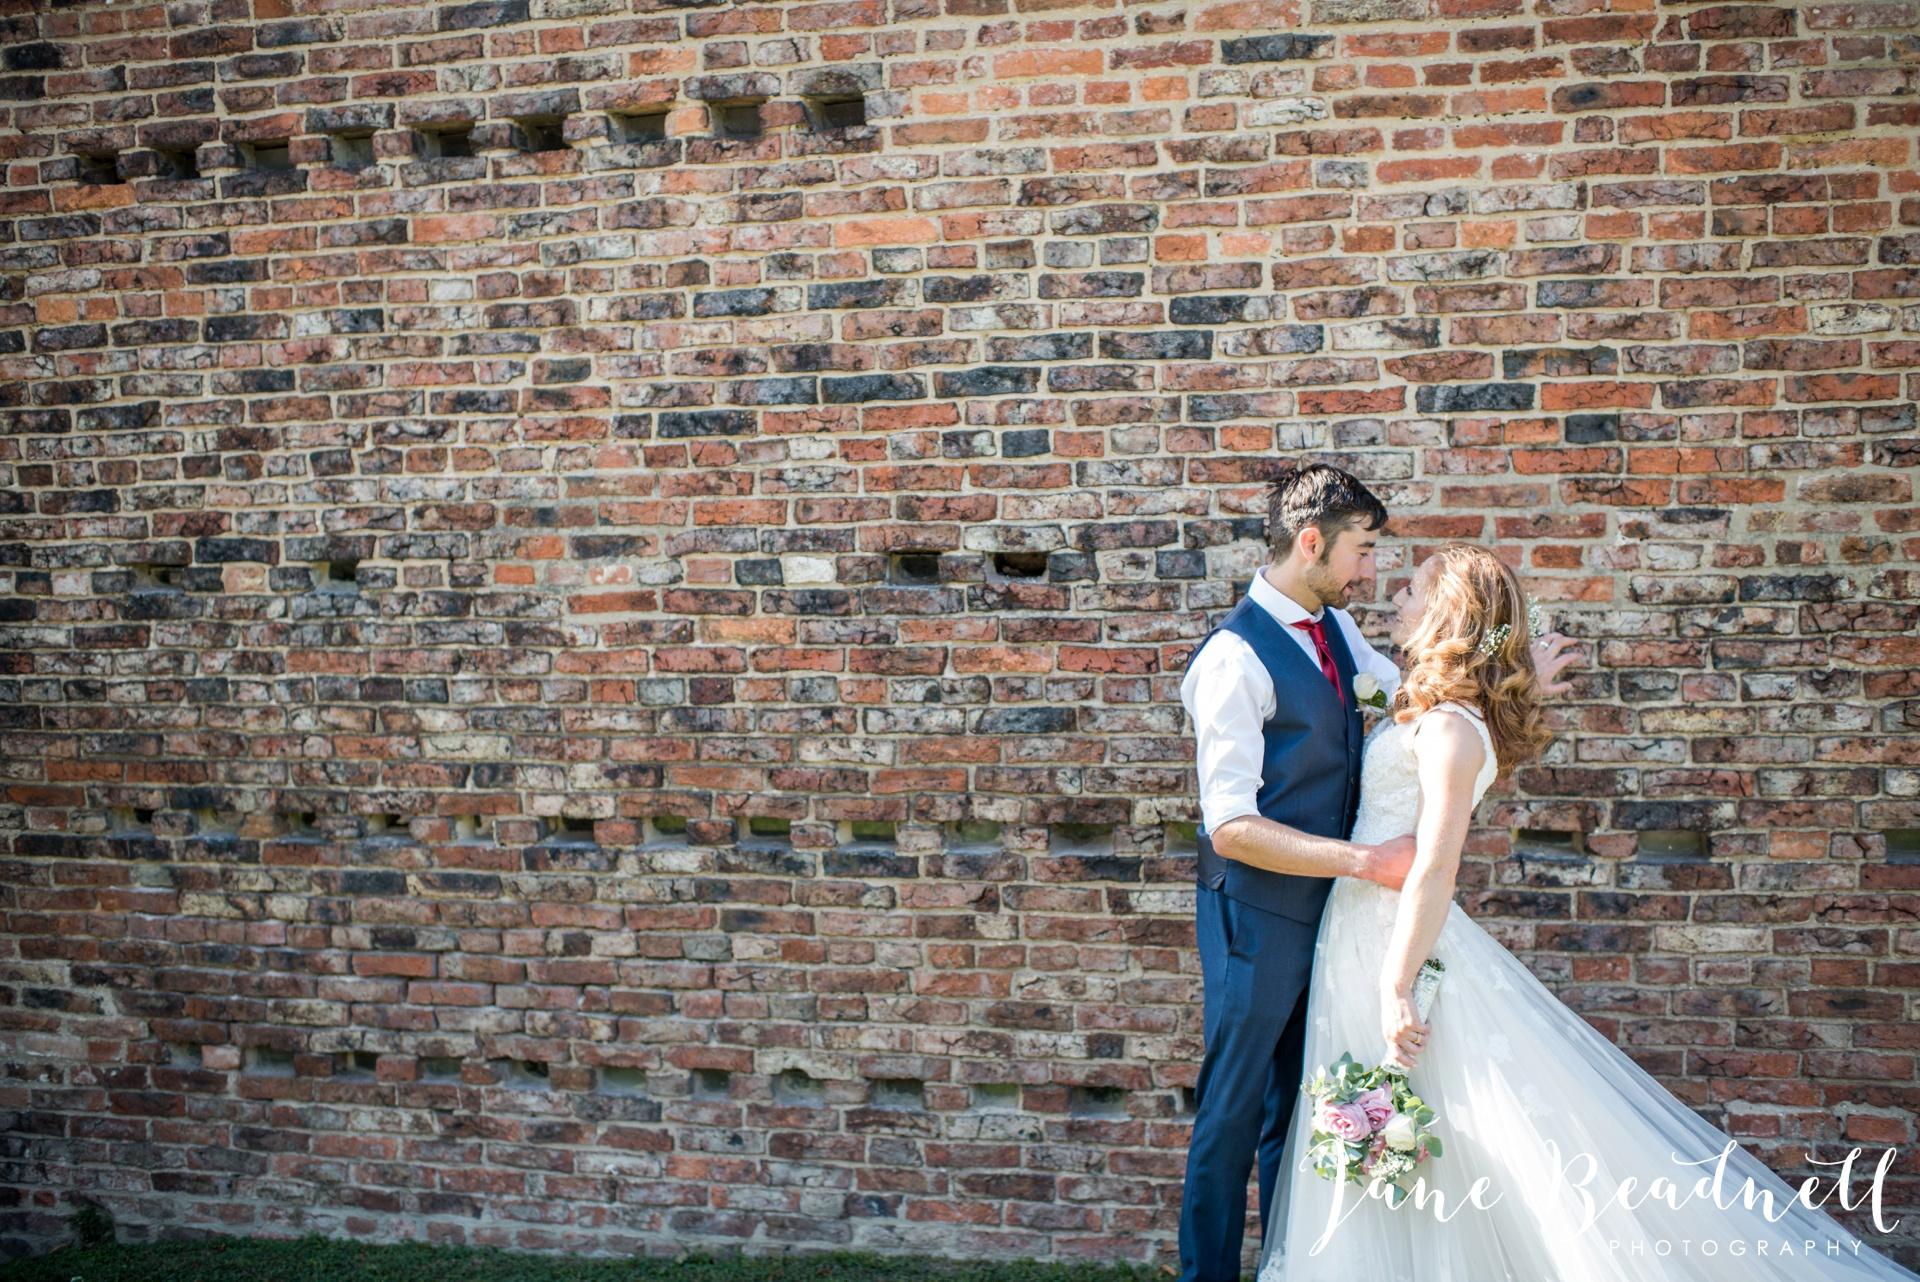 yorkshire-fine-art-wedding-photographer-jane-beadnell-photography-poppleton-york_0110